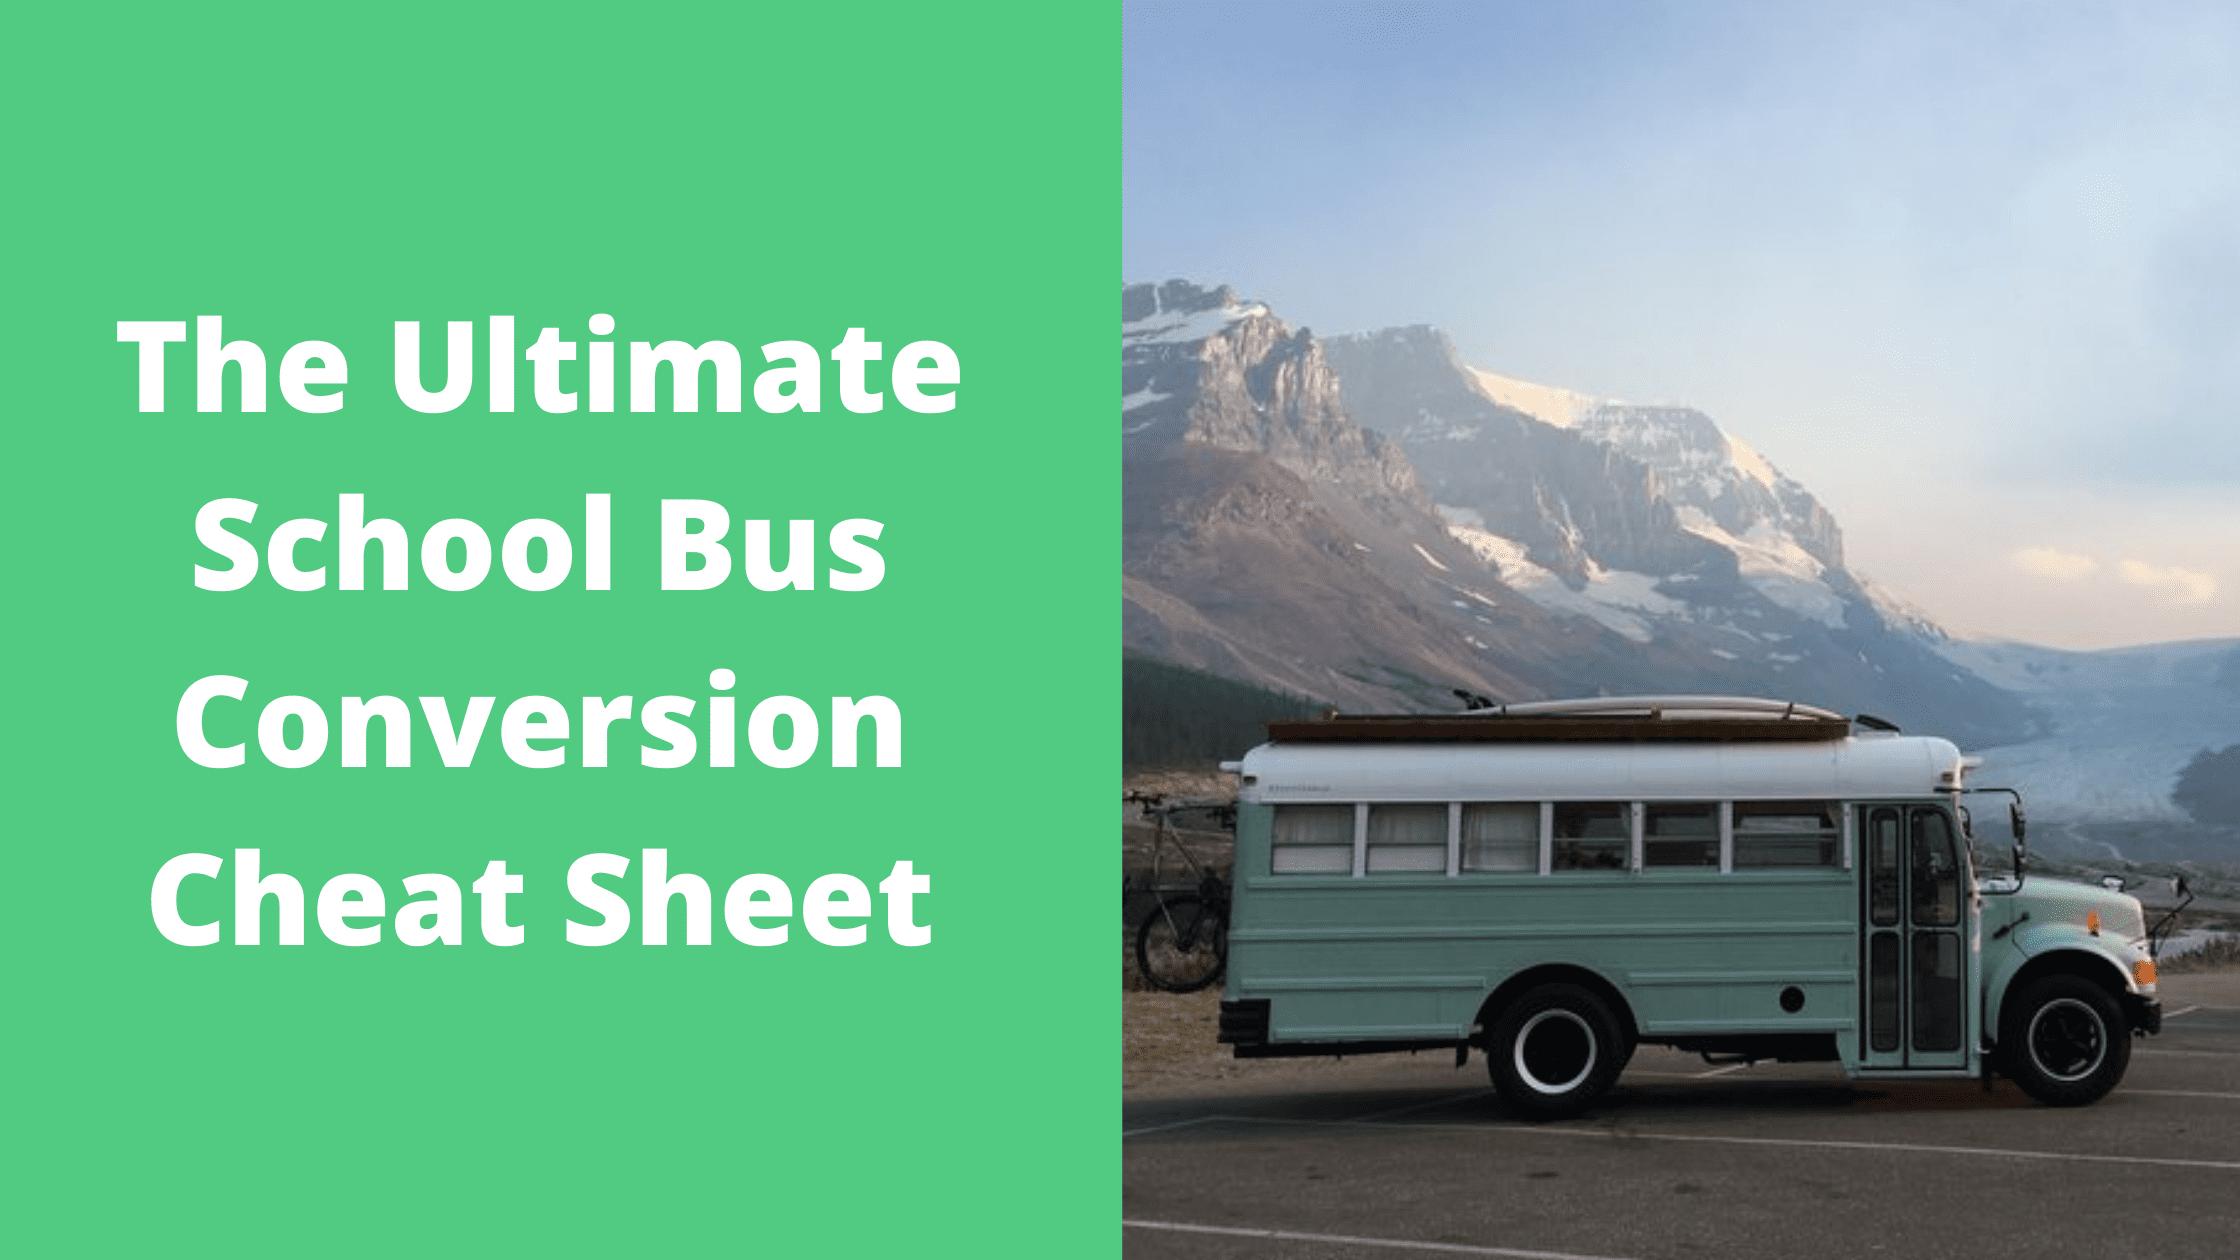 School Bus Conversion Cheat Sheet